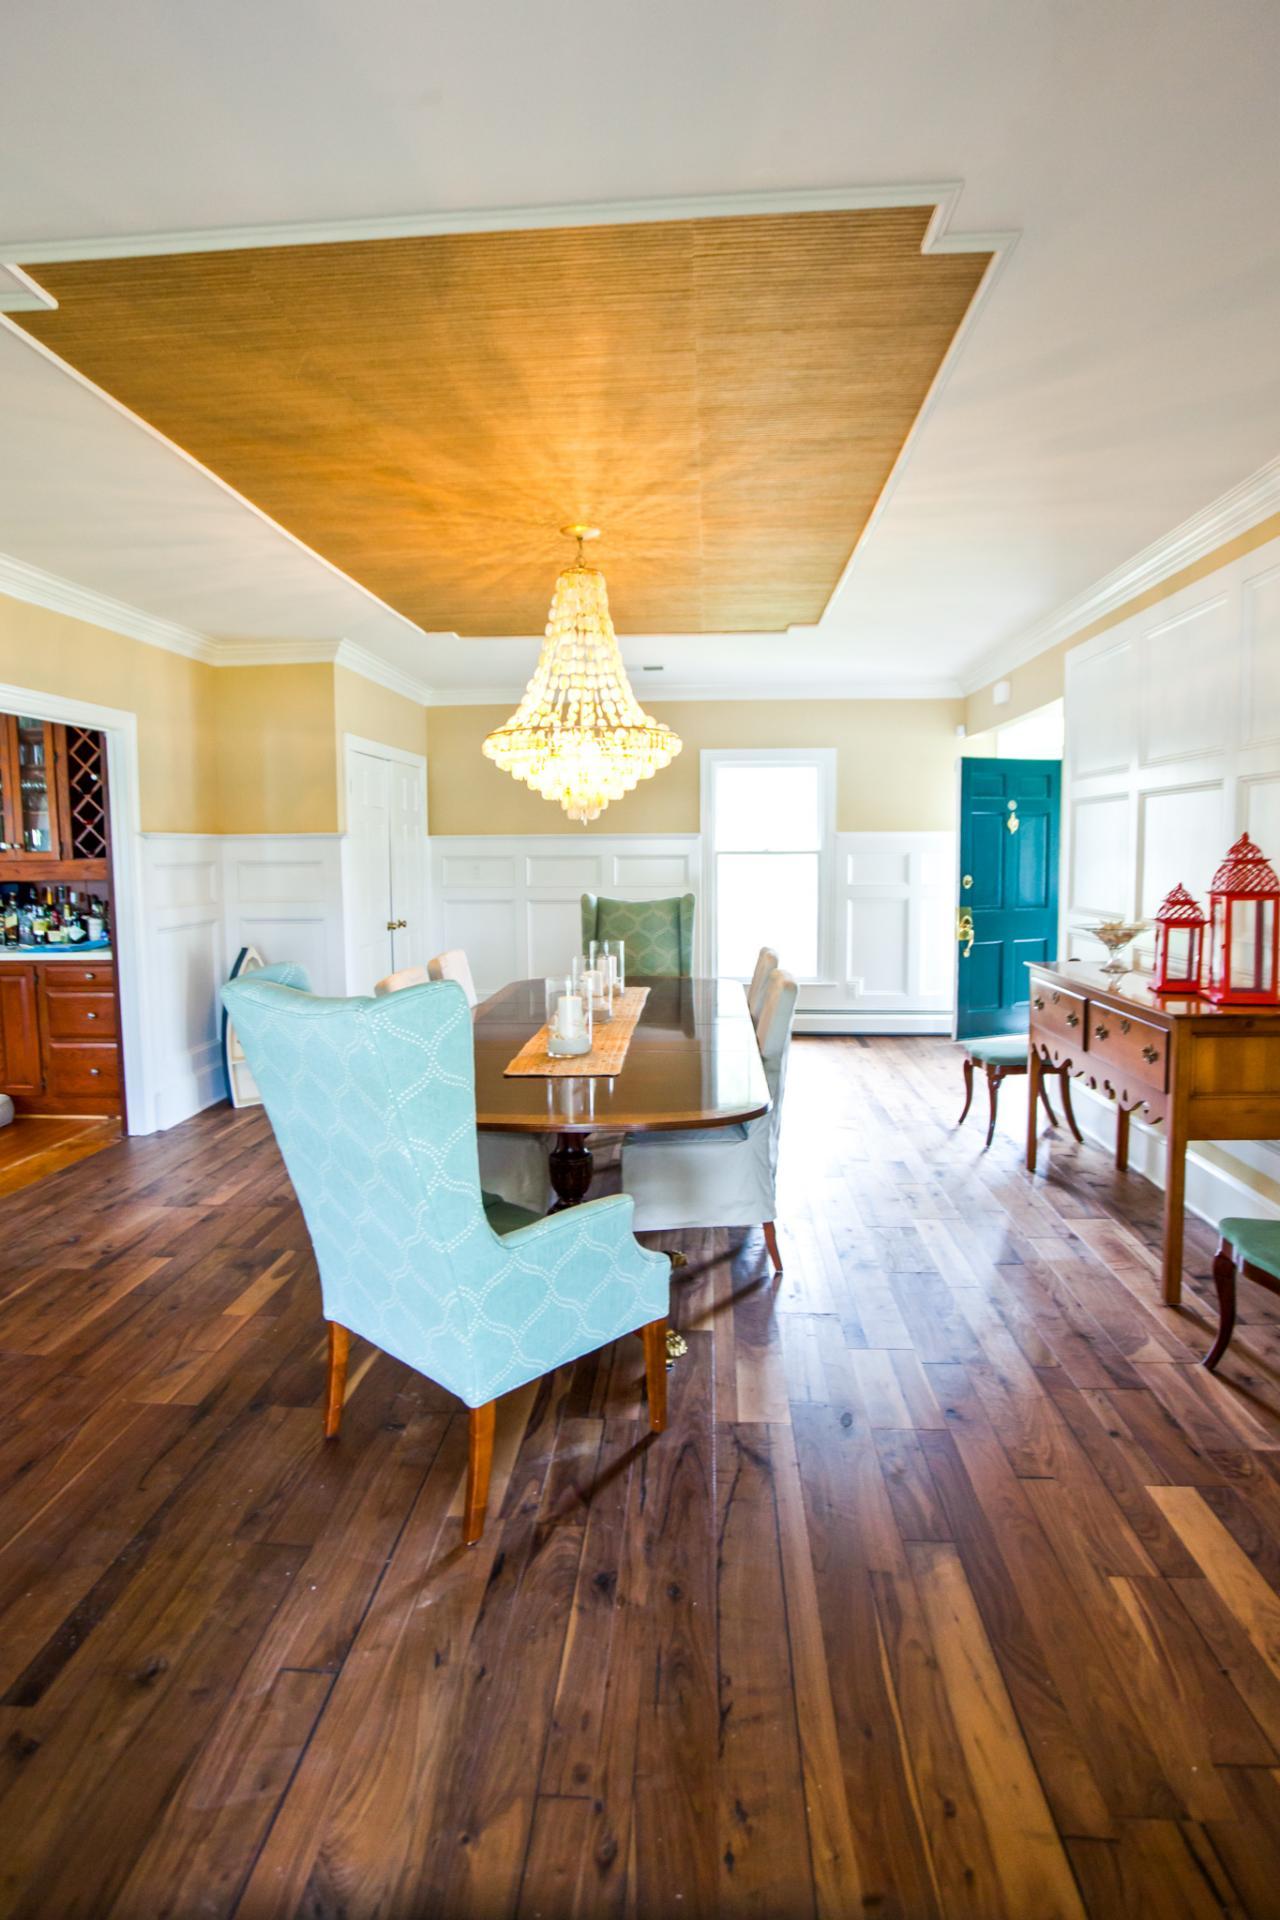 How to Refinish Hardwood Floors Diy wood floors